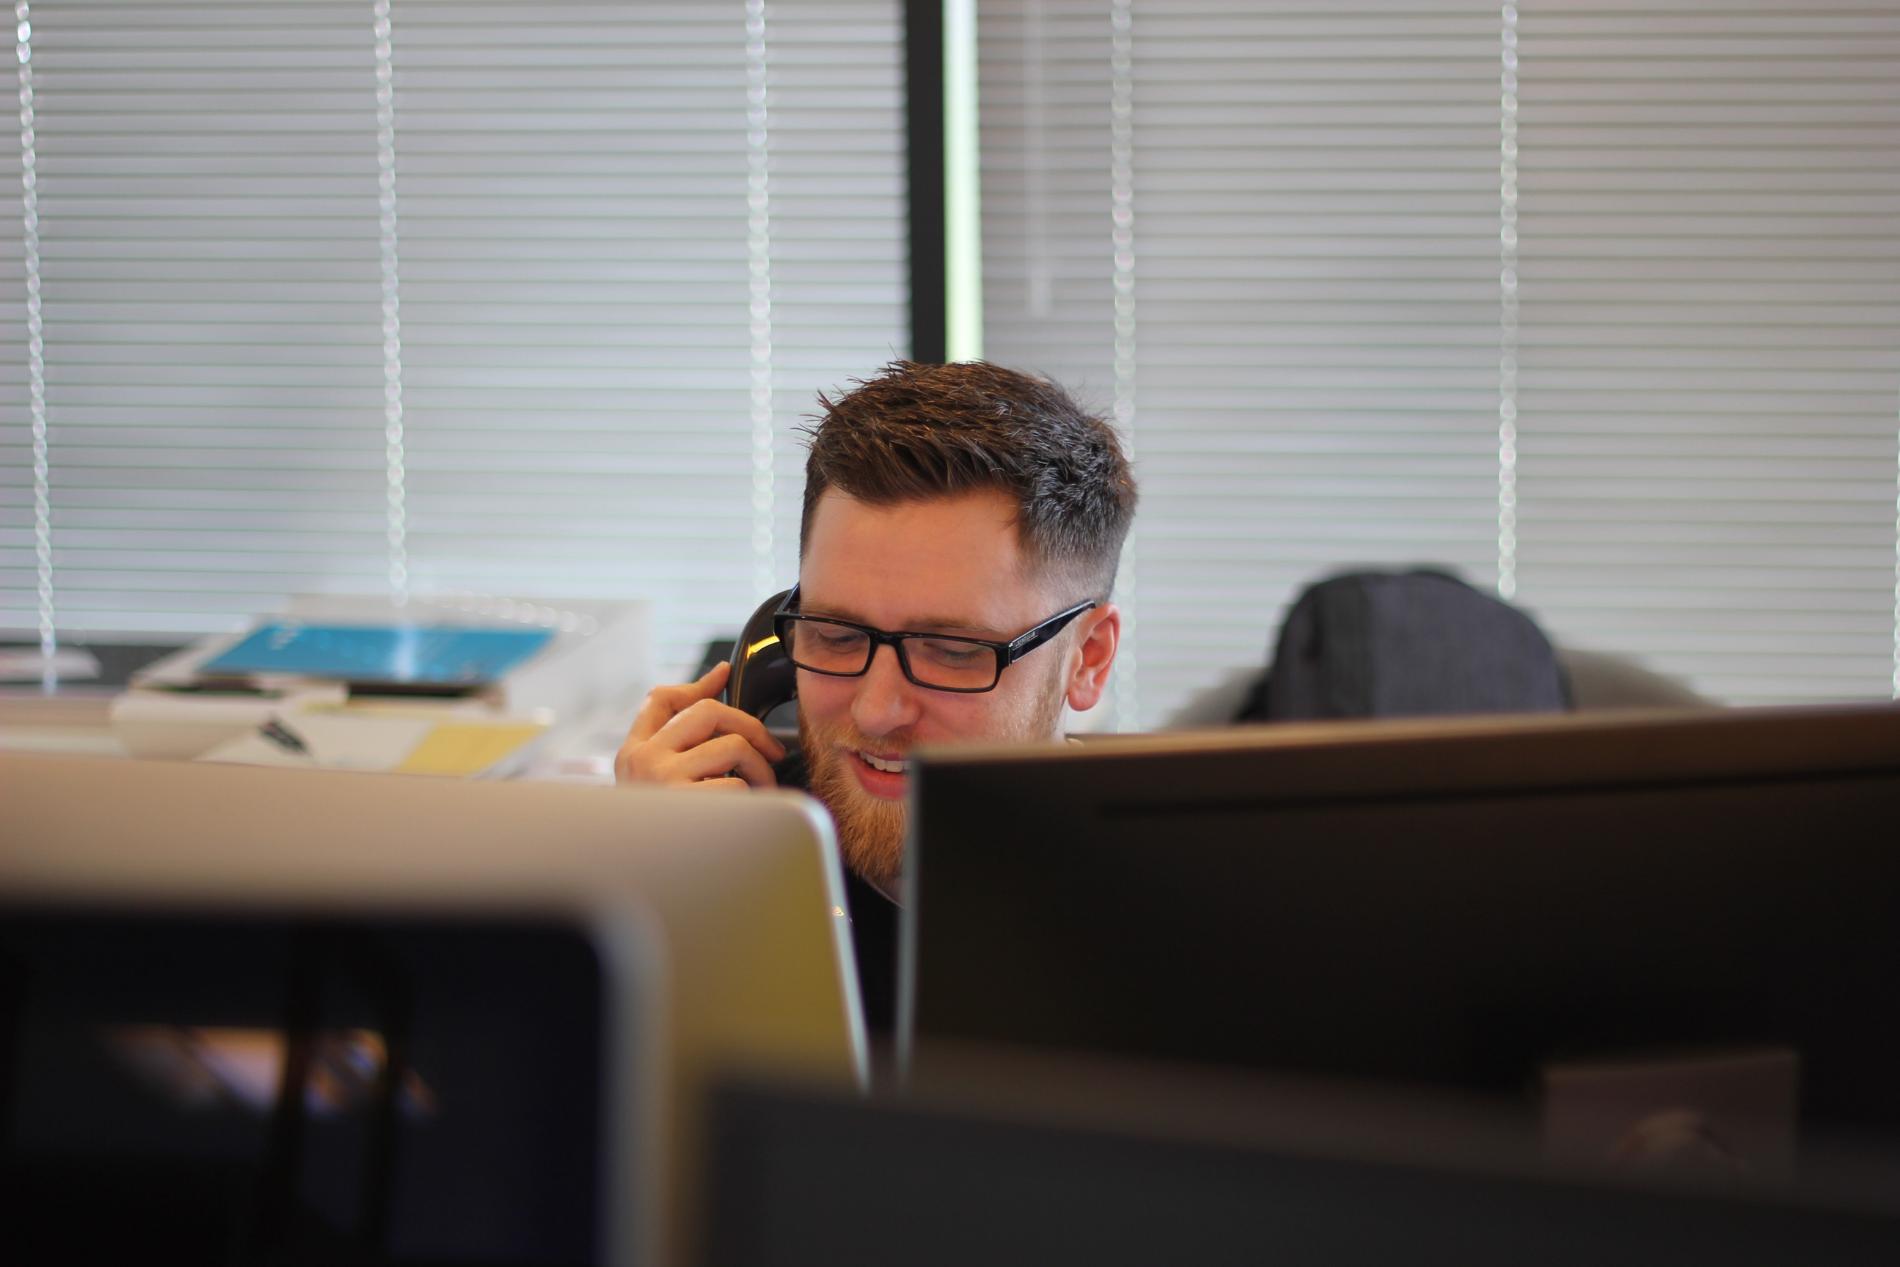 Man using a desk phone